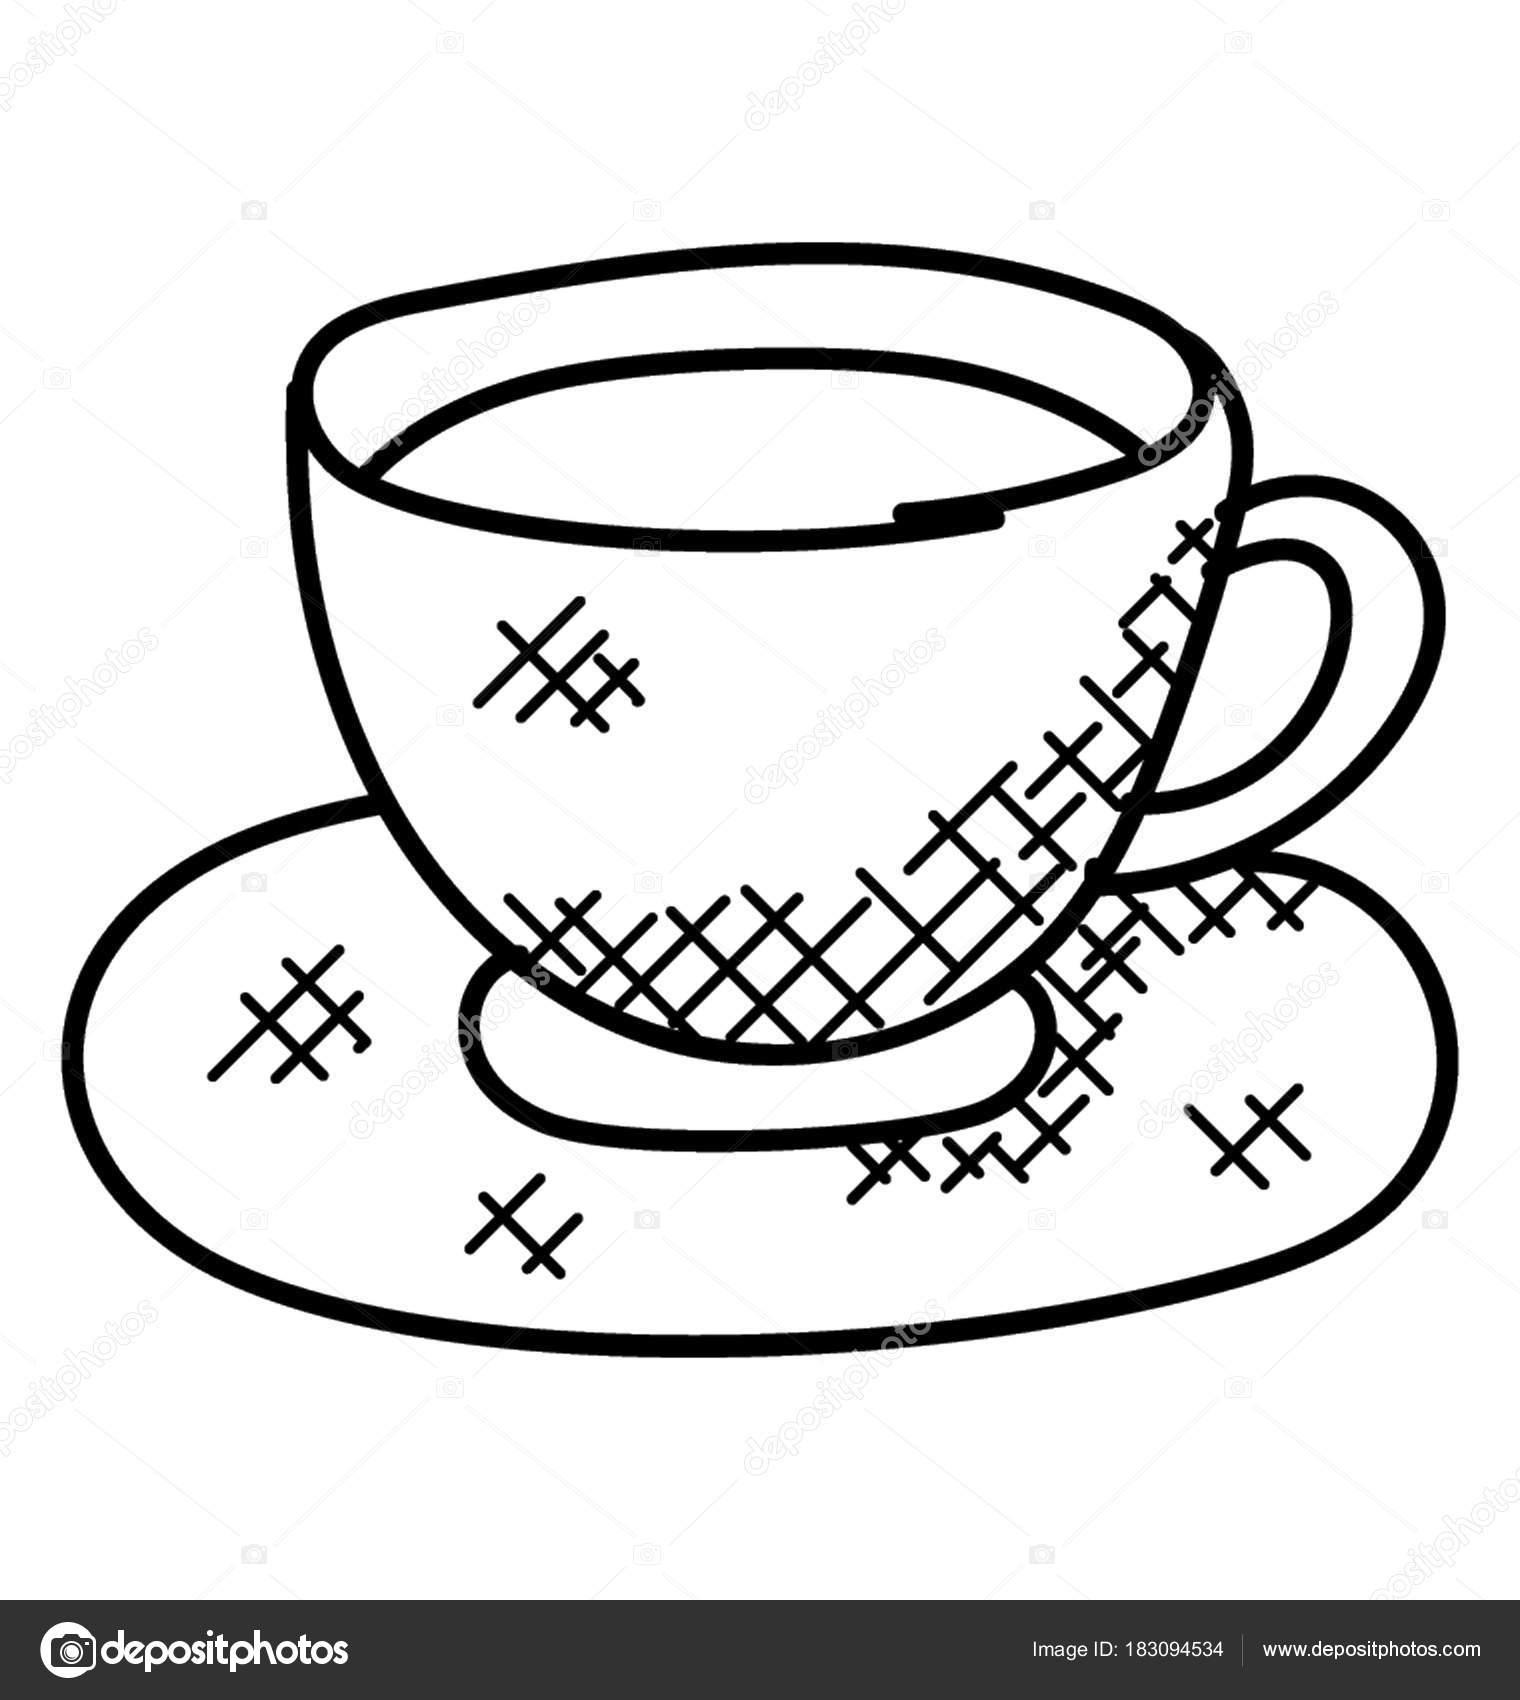 Cup Tea Placed Saucer Doodle Vector Stock Vector C Creativestall